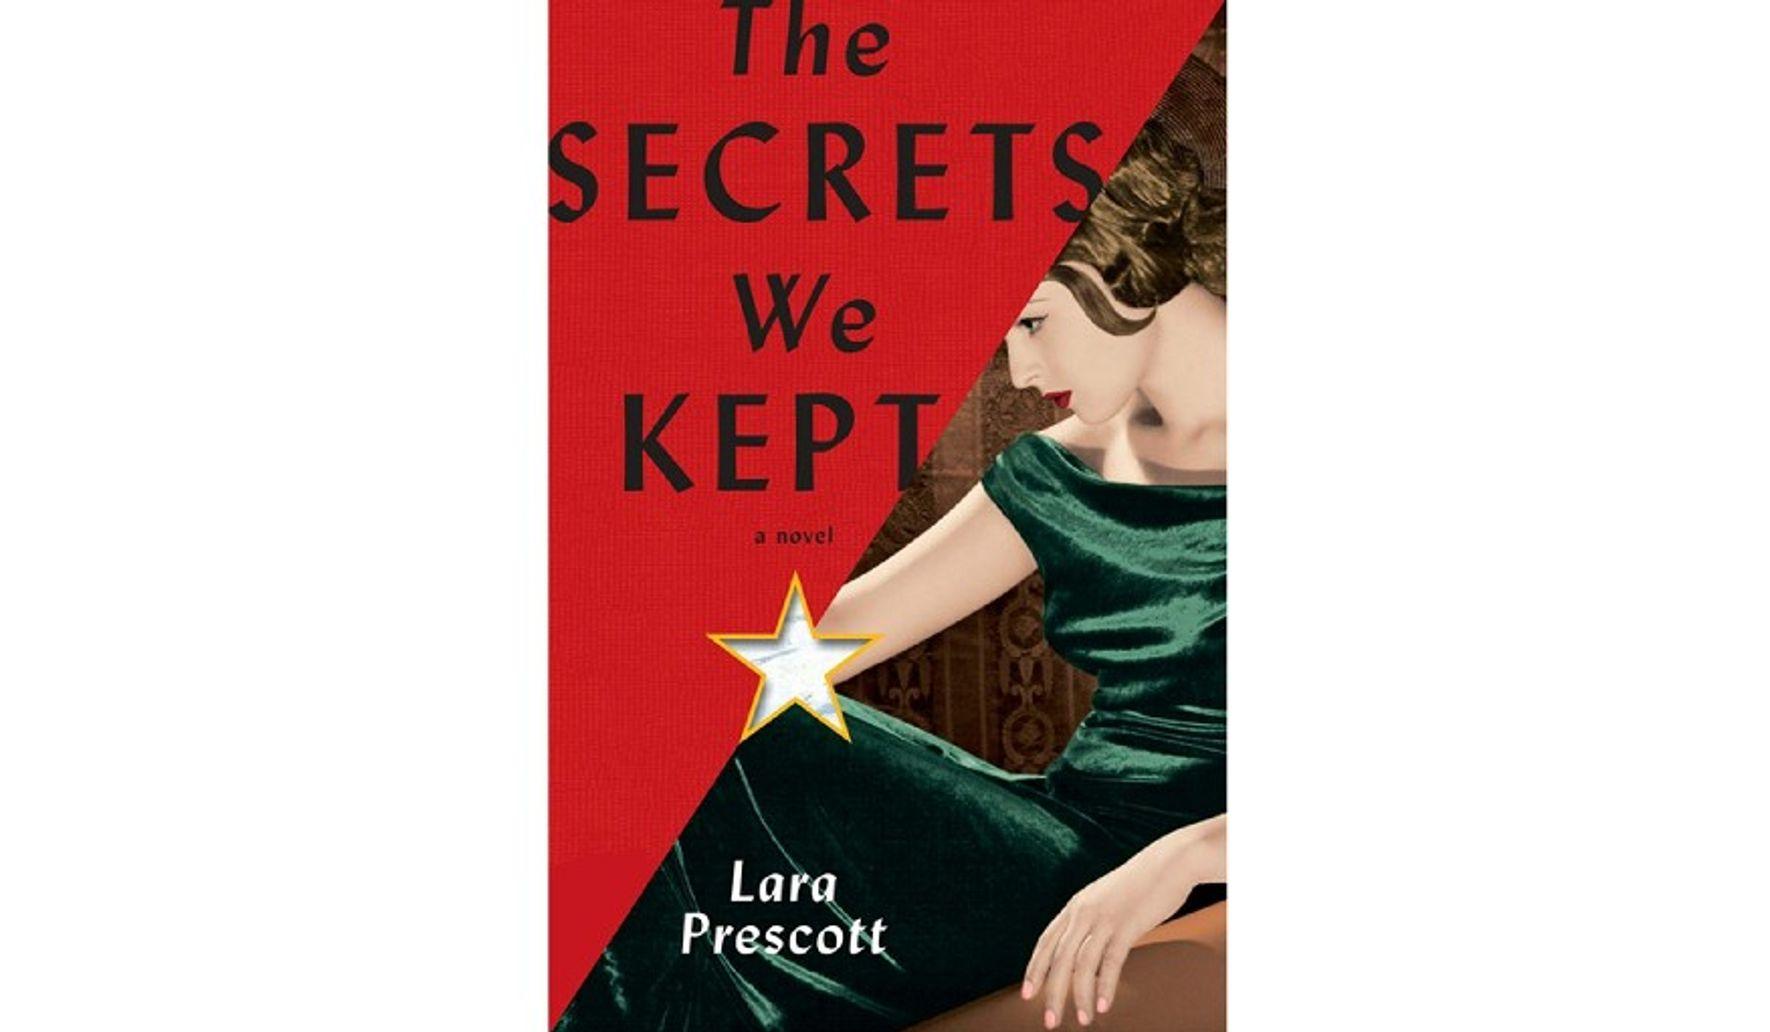 BOOK REVIEW: 'The Secrets We Kept'